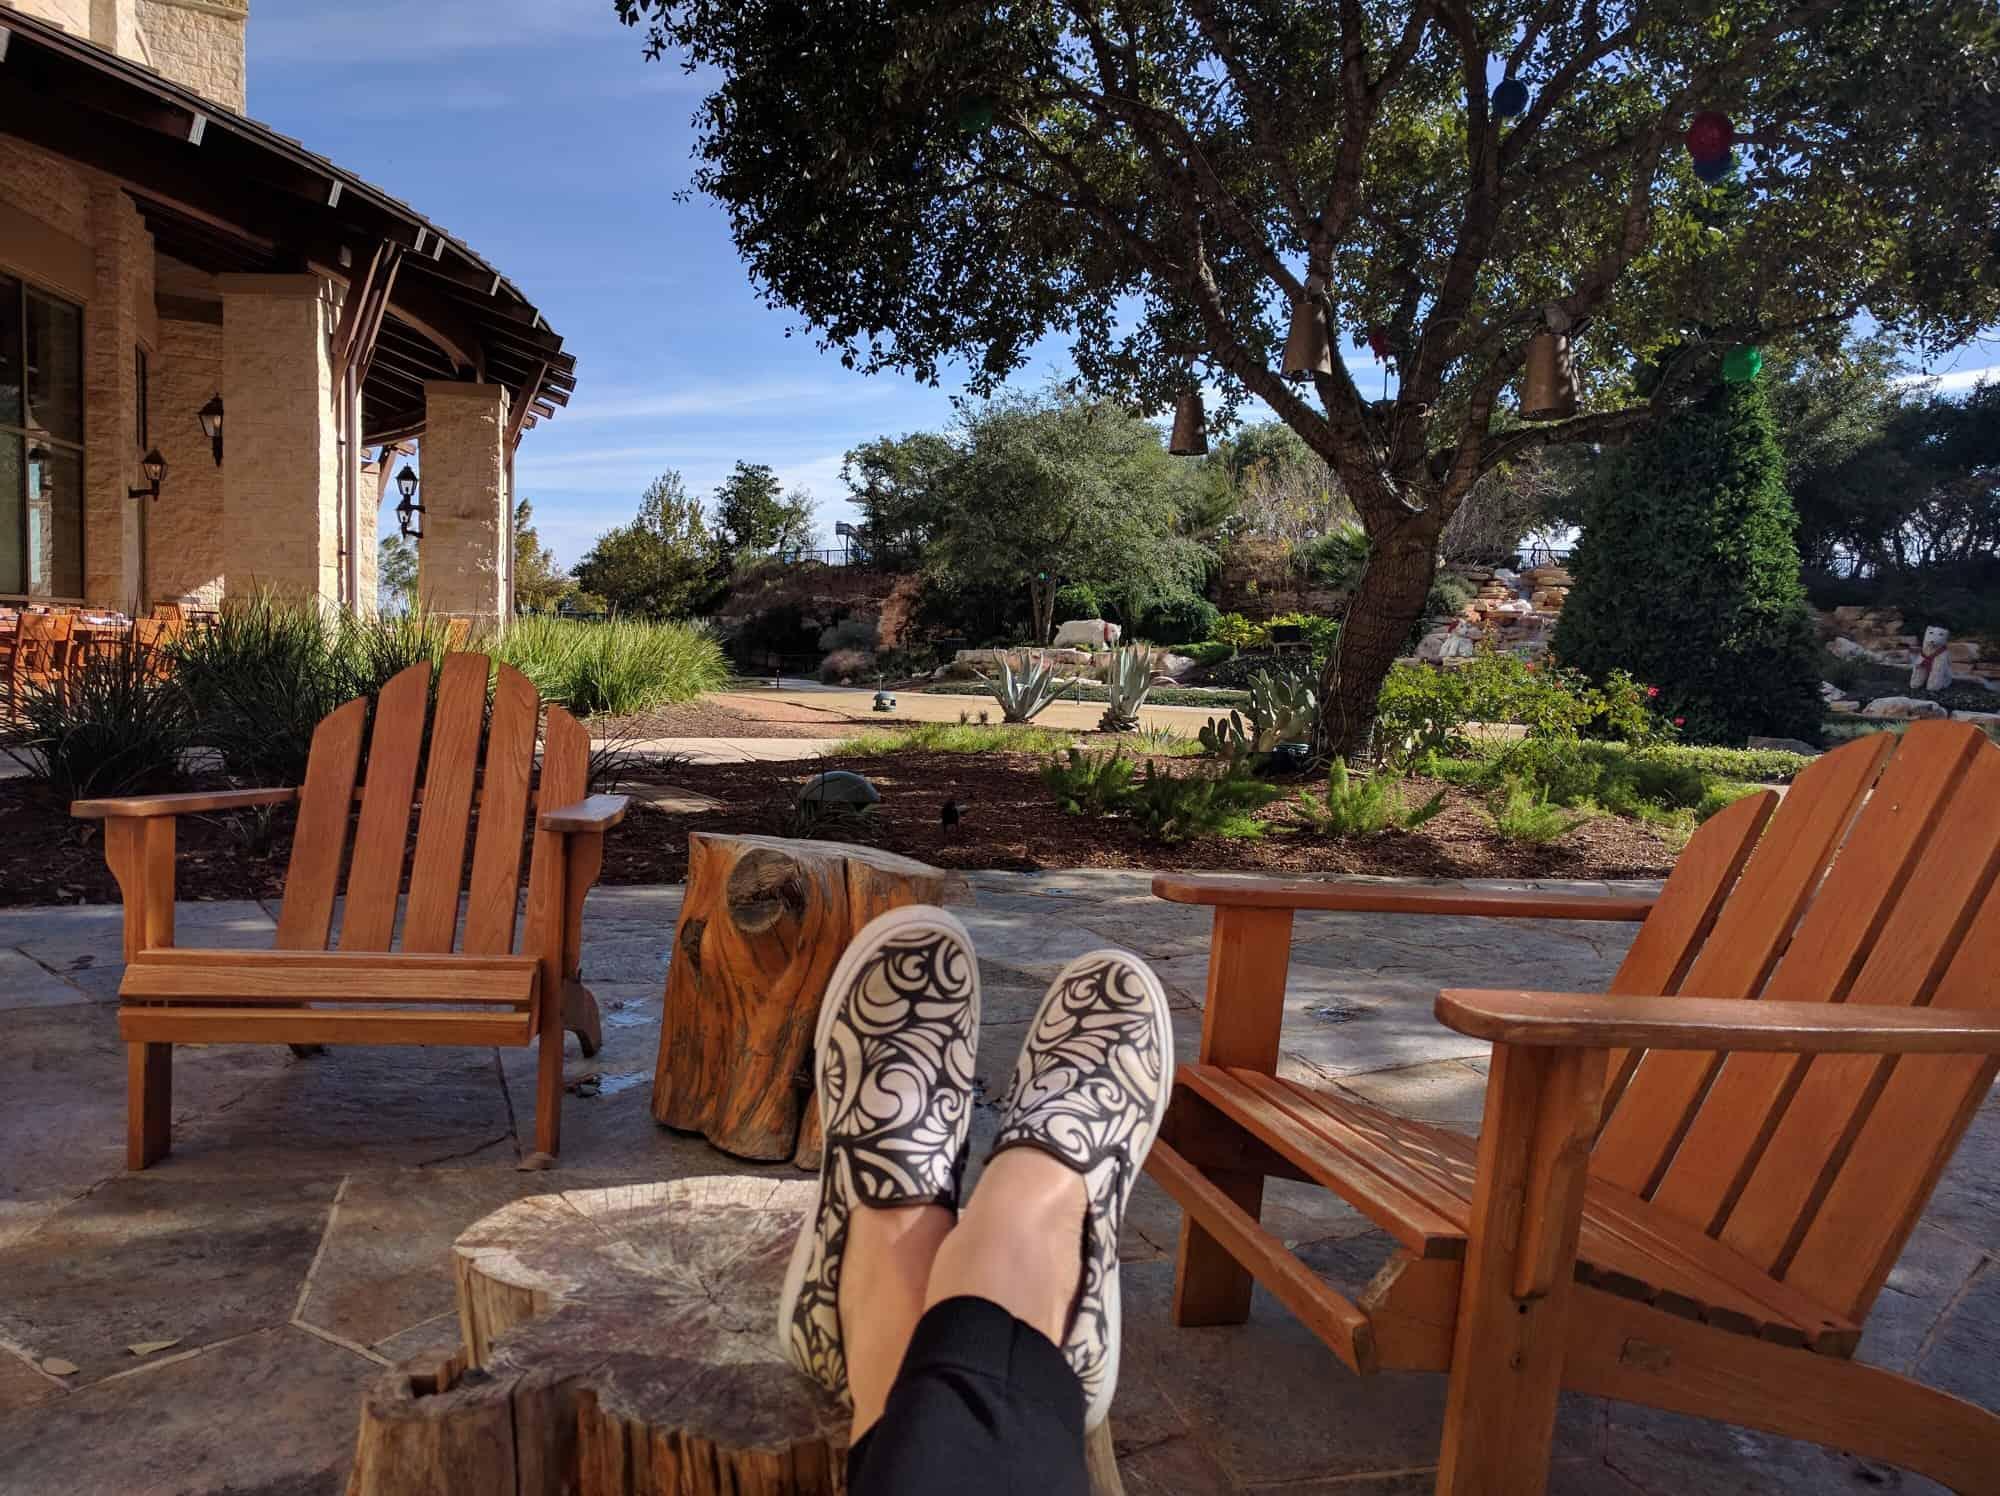 Top Texas Weekend Getaways for Families